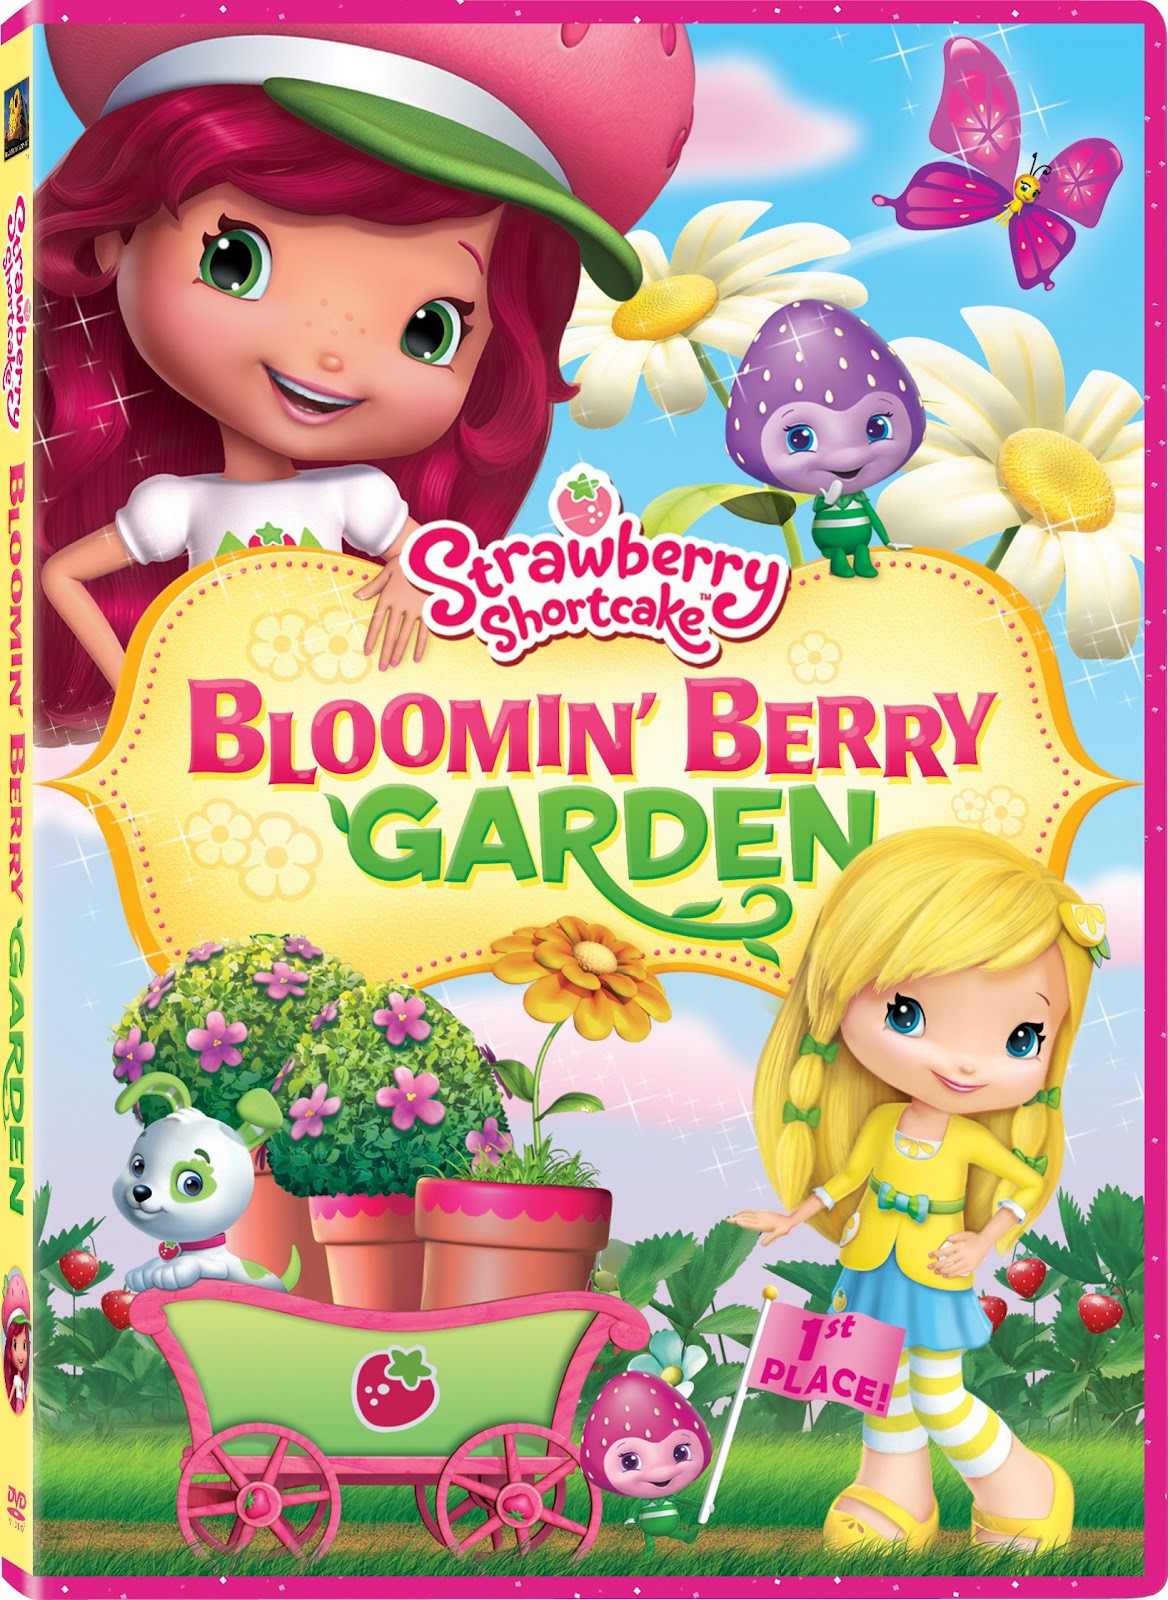 Strawberry Shortcake Dvds  My Springfield Mommy Strawberry Shortcake Is Back In Two